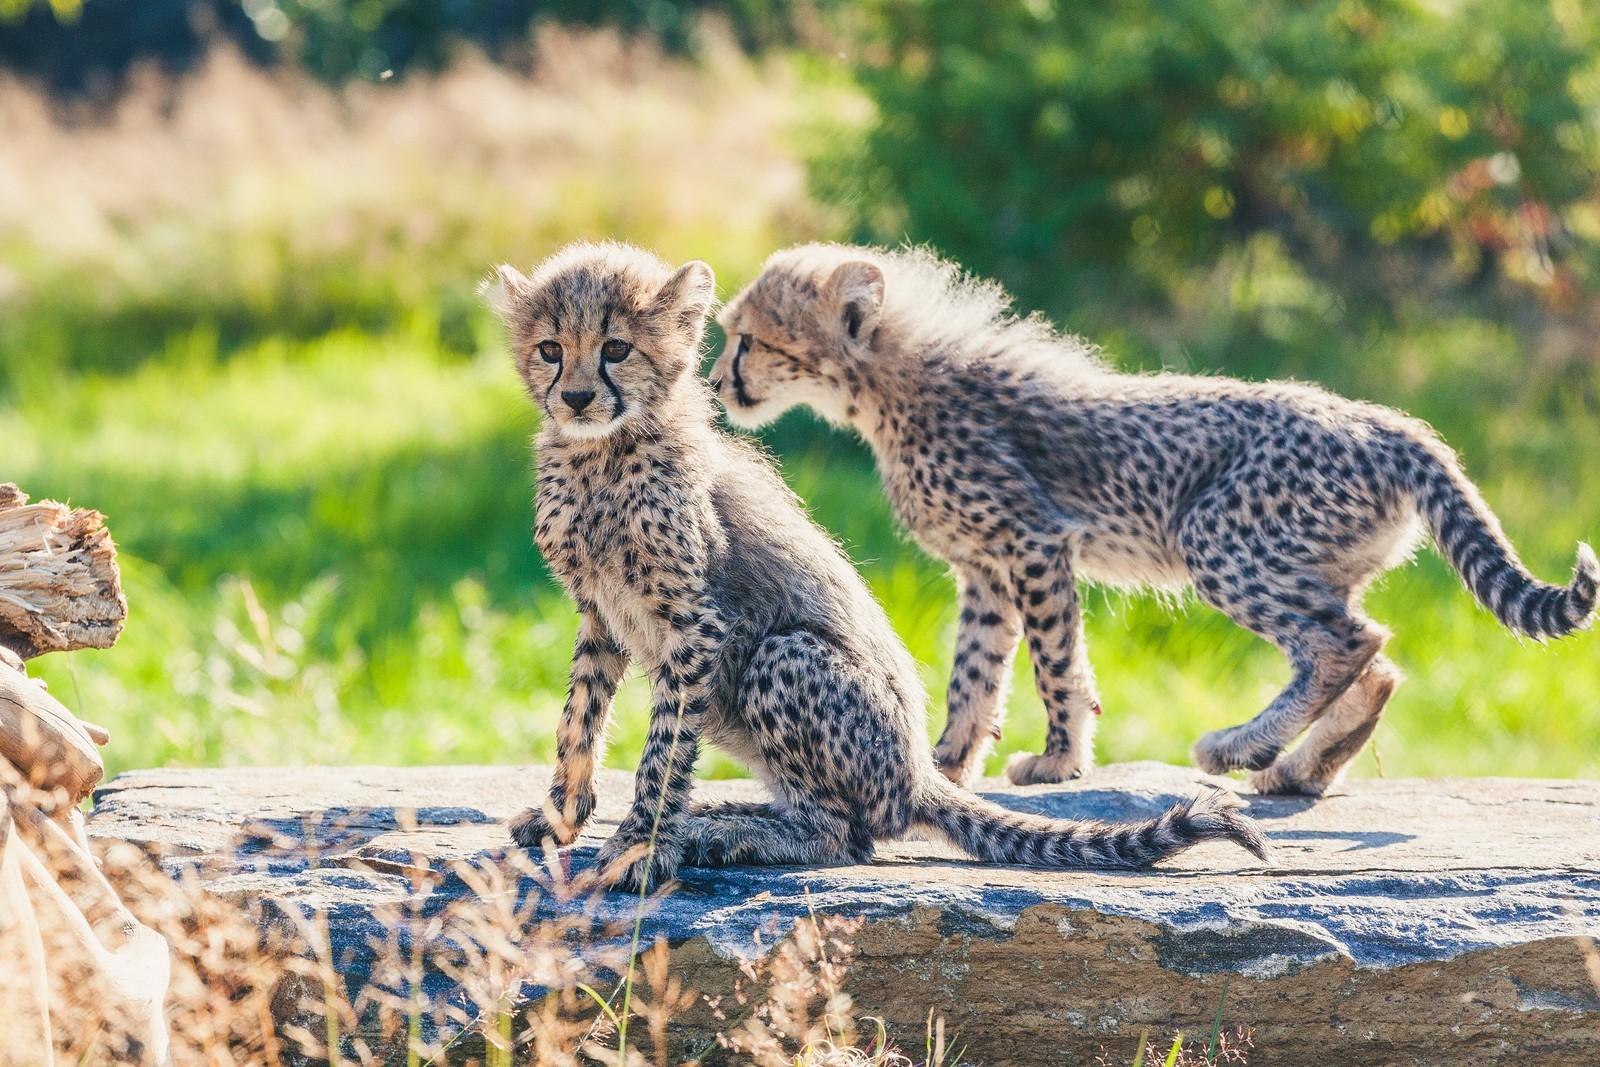 Gepardene i friluft